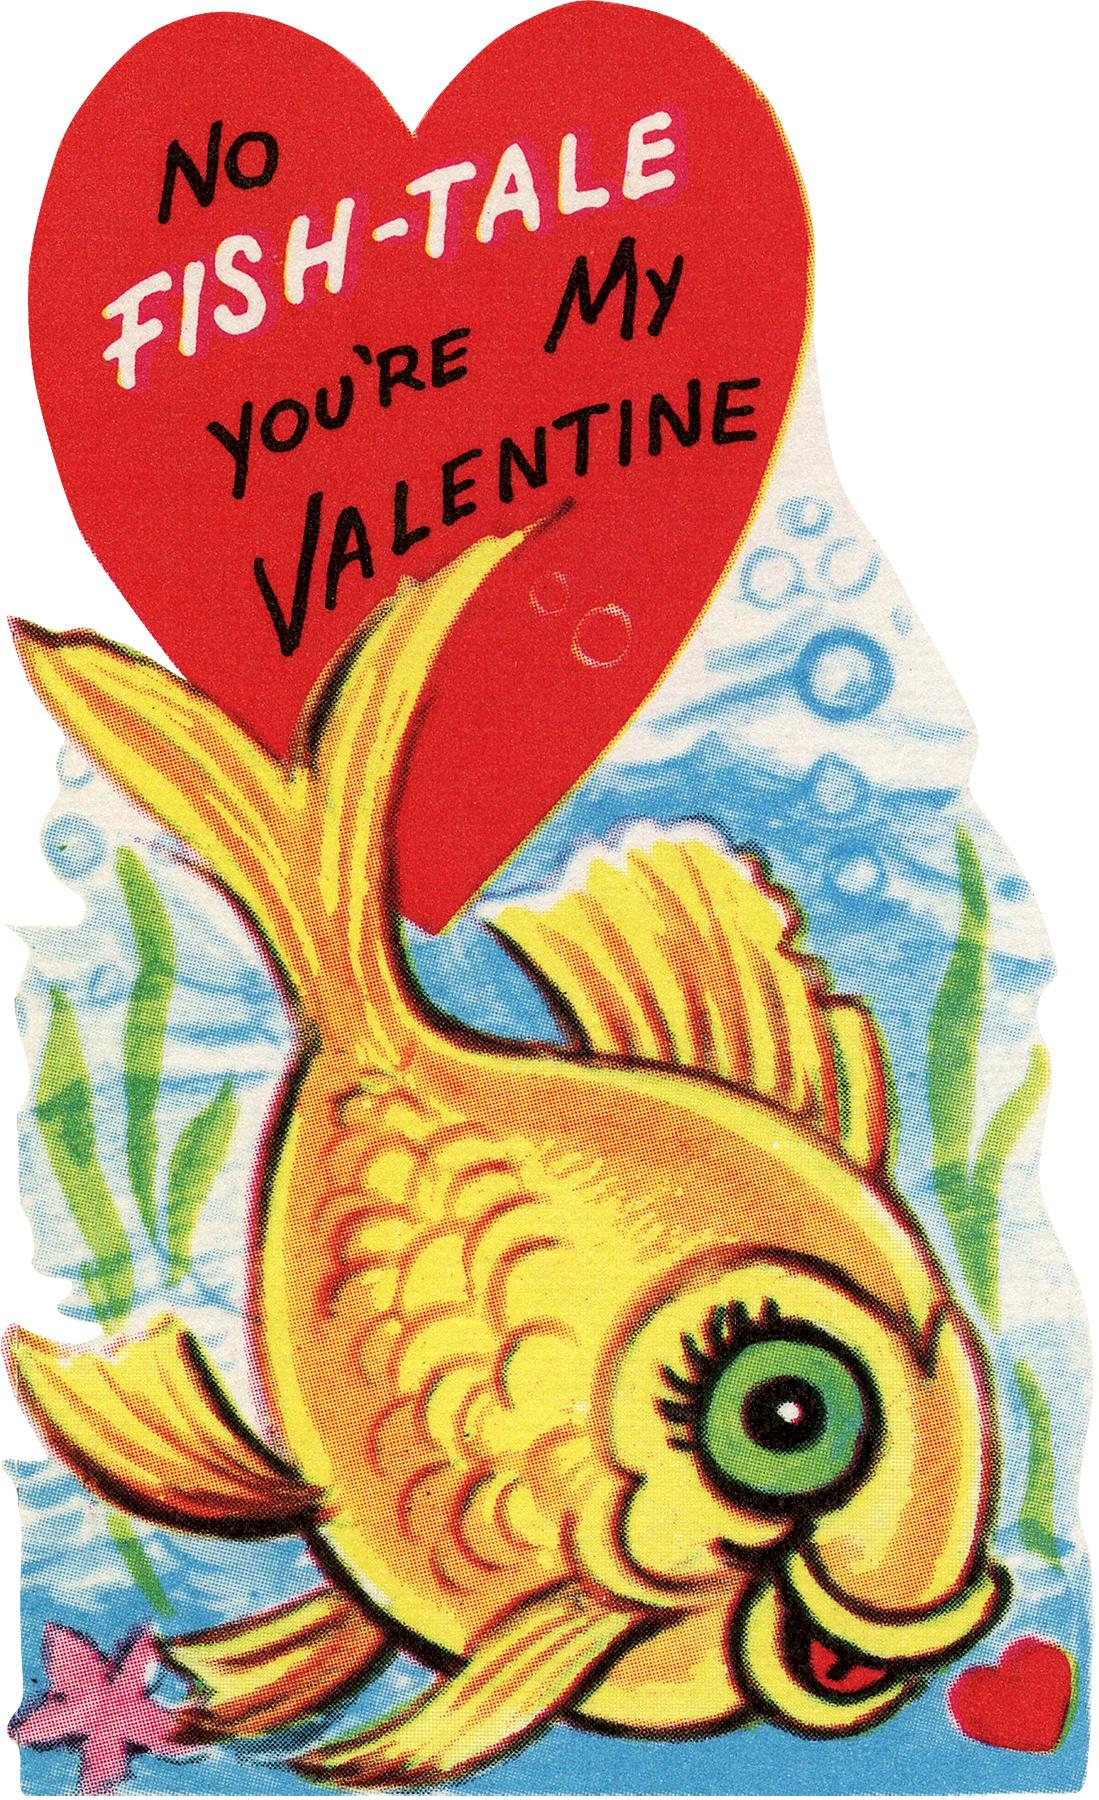 Retro Valentine Goldfish Image